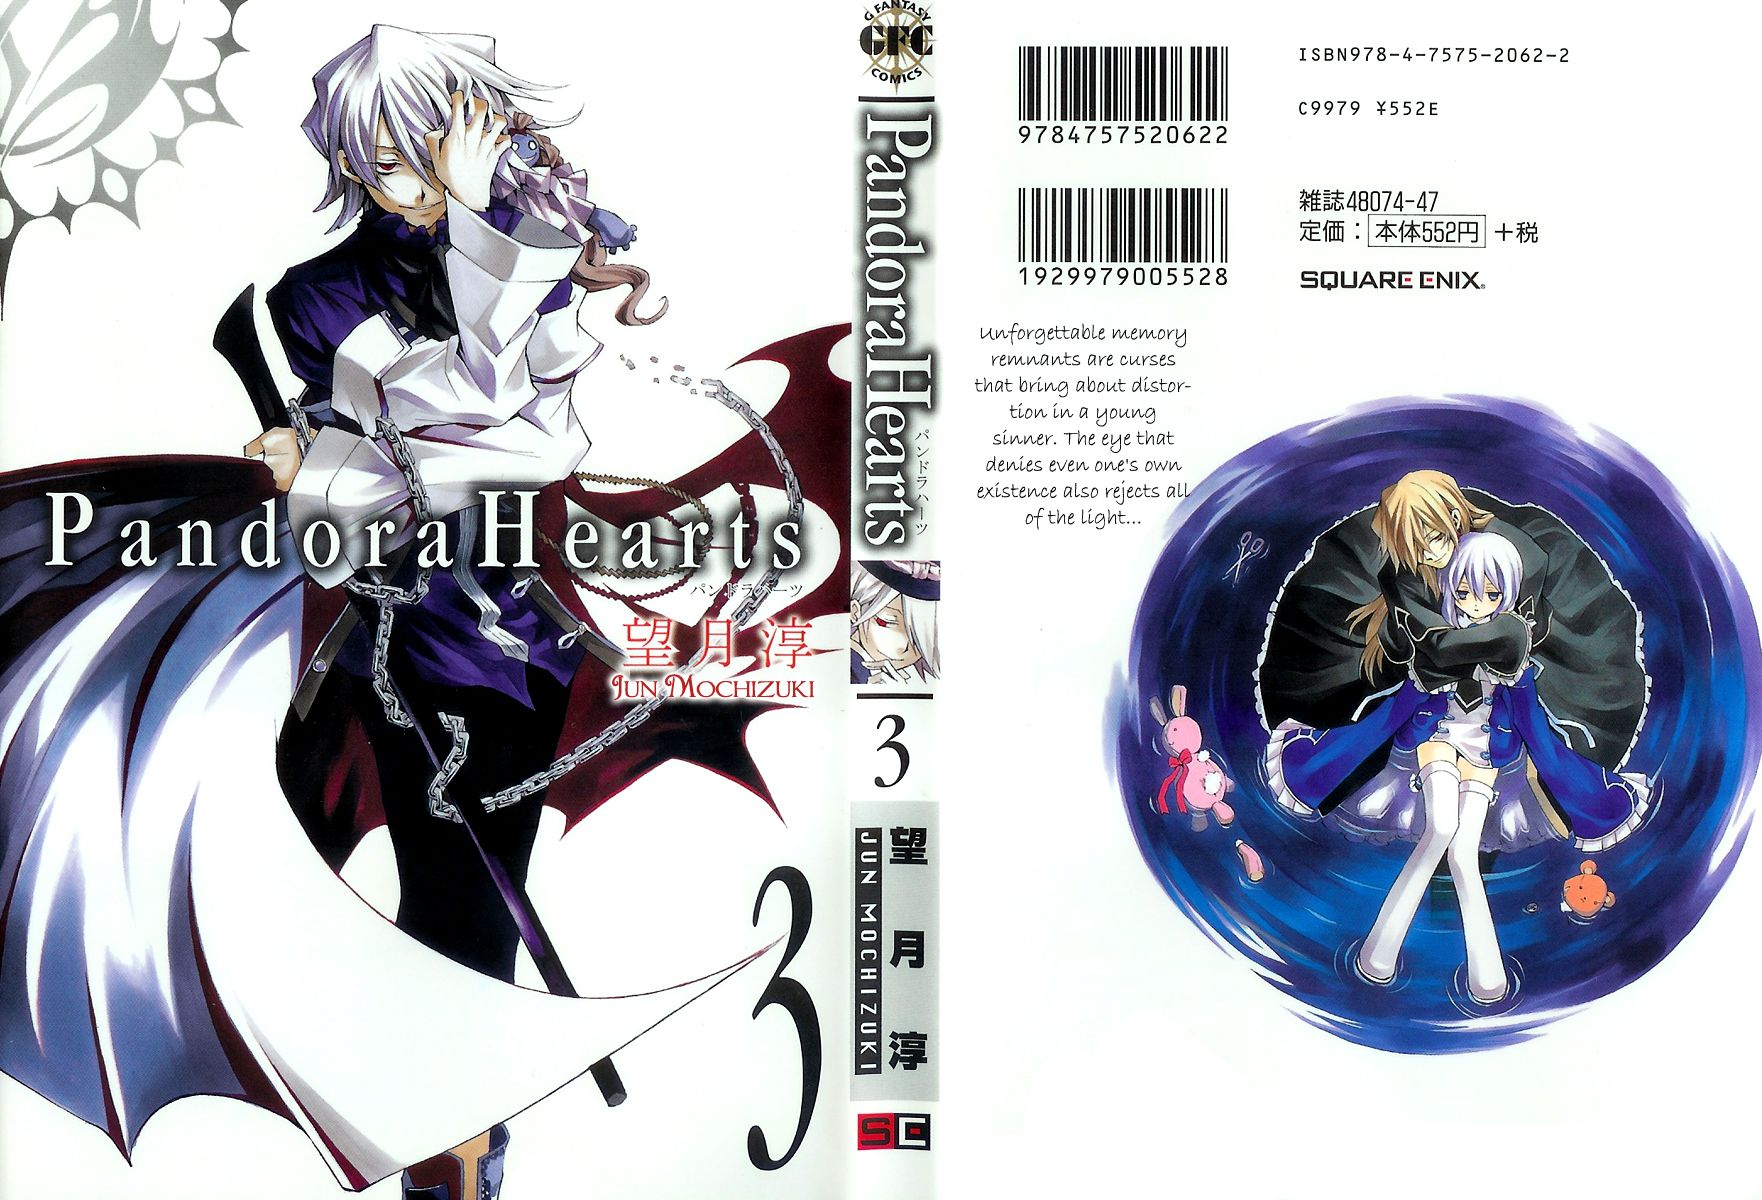 Pandora Hearts Kapitel 10 Englisch - Proxer.Me